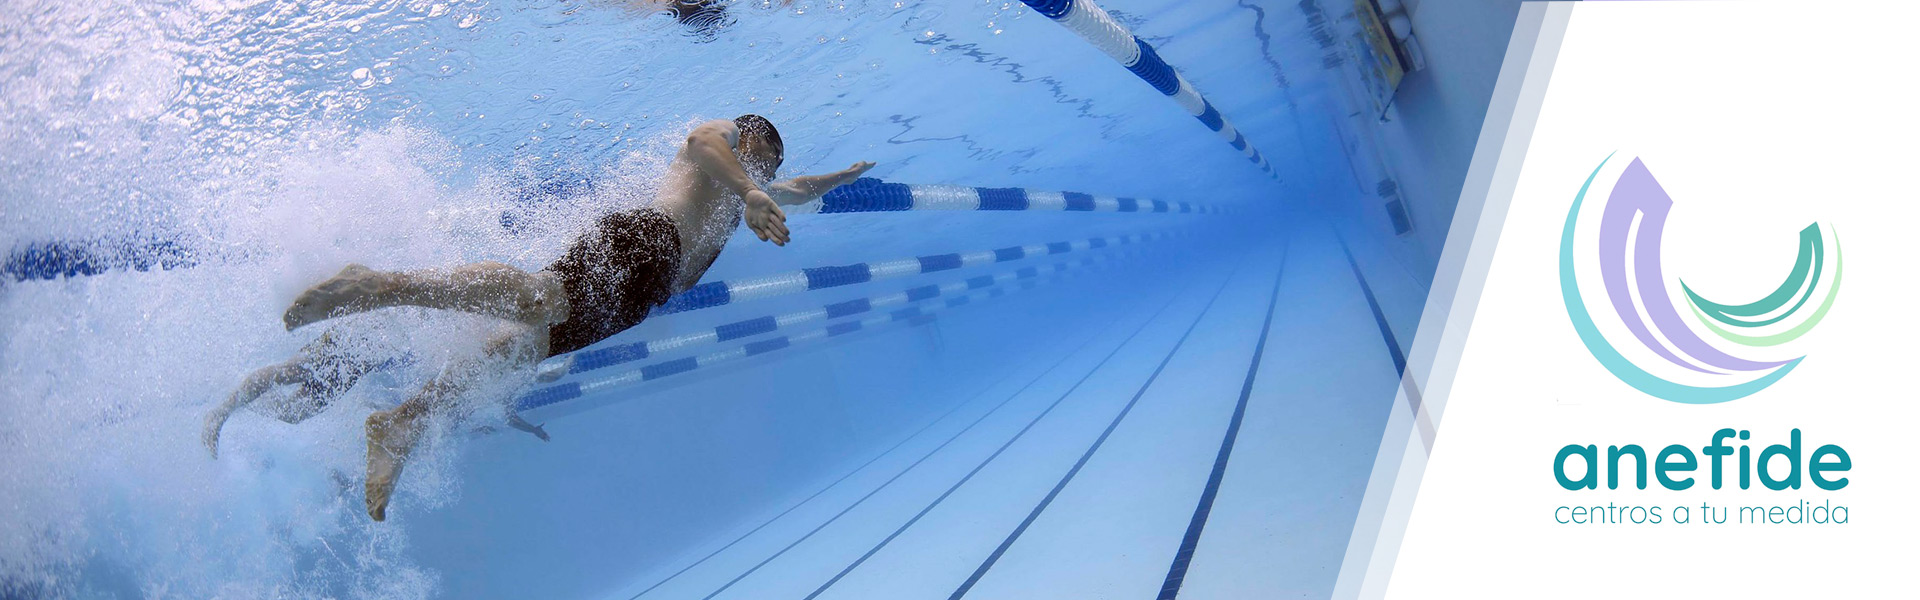 anefide-natacion